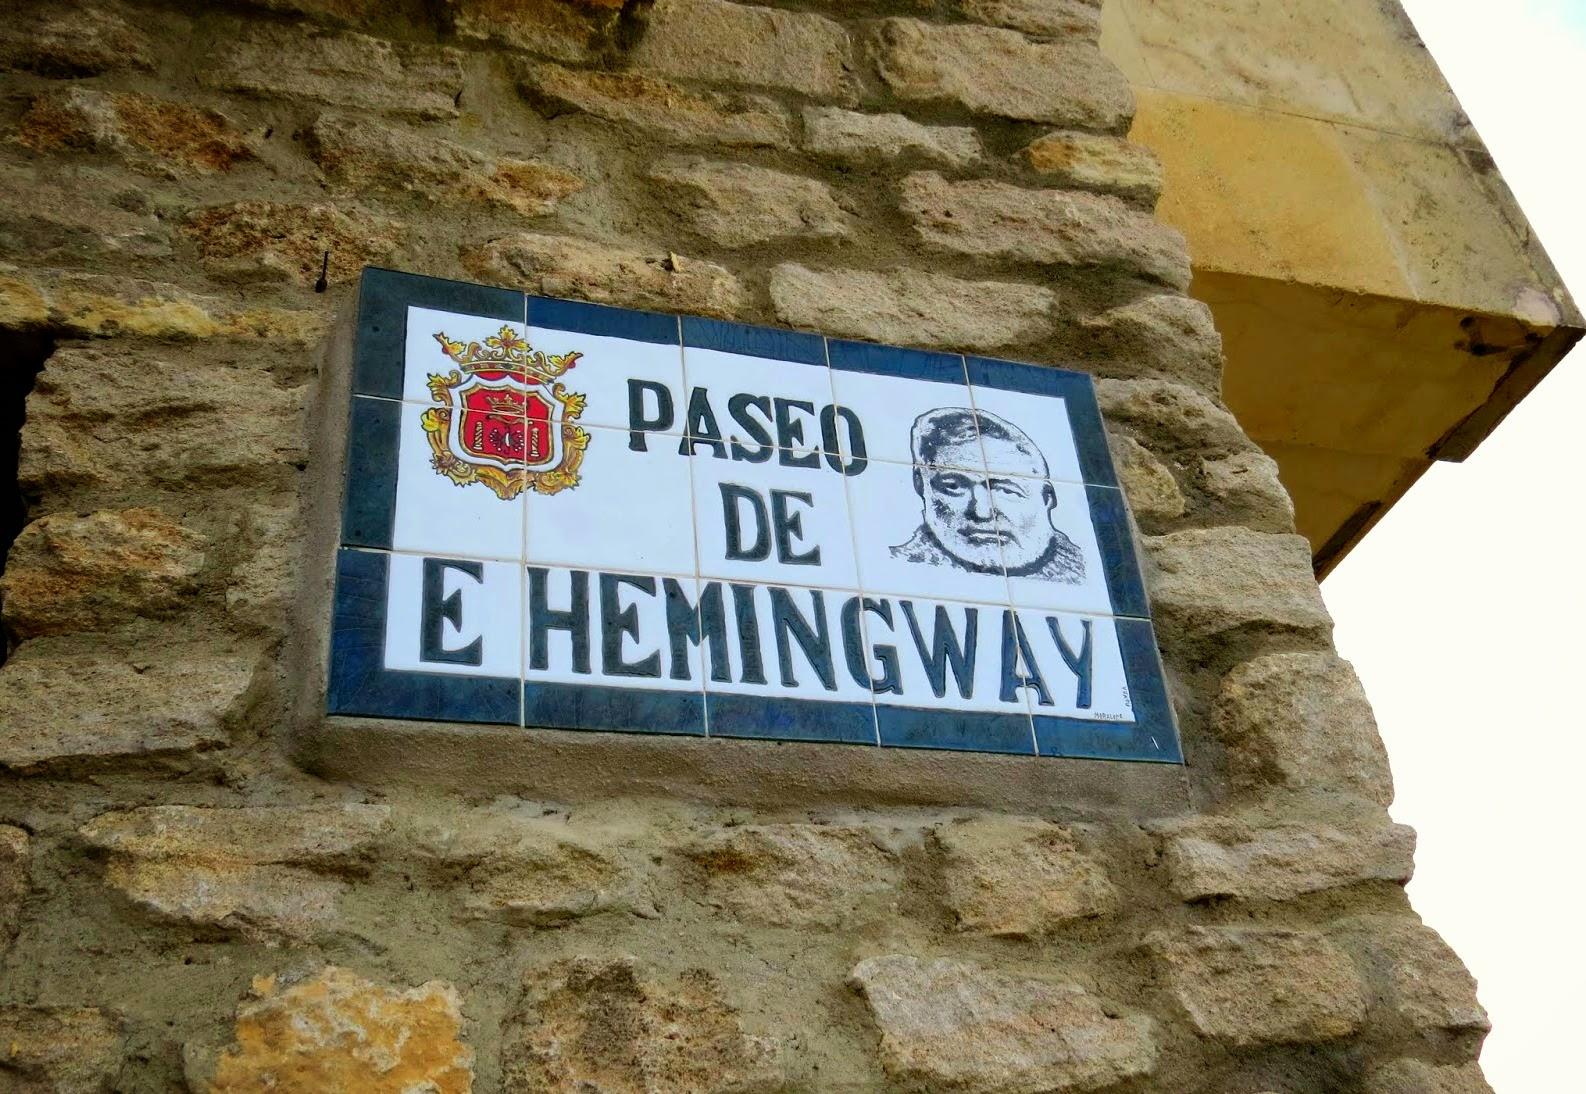 Hemingway Street